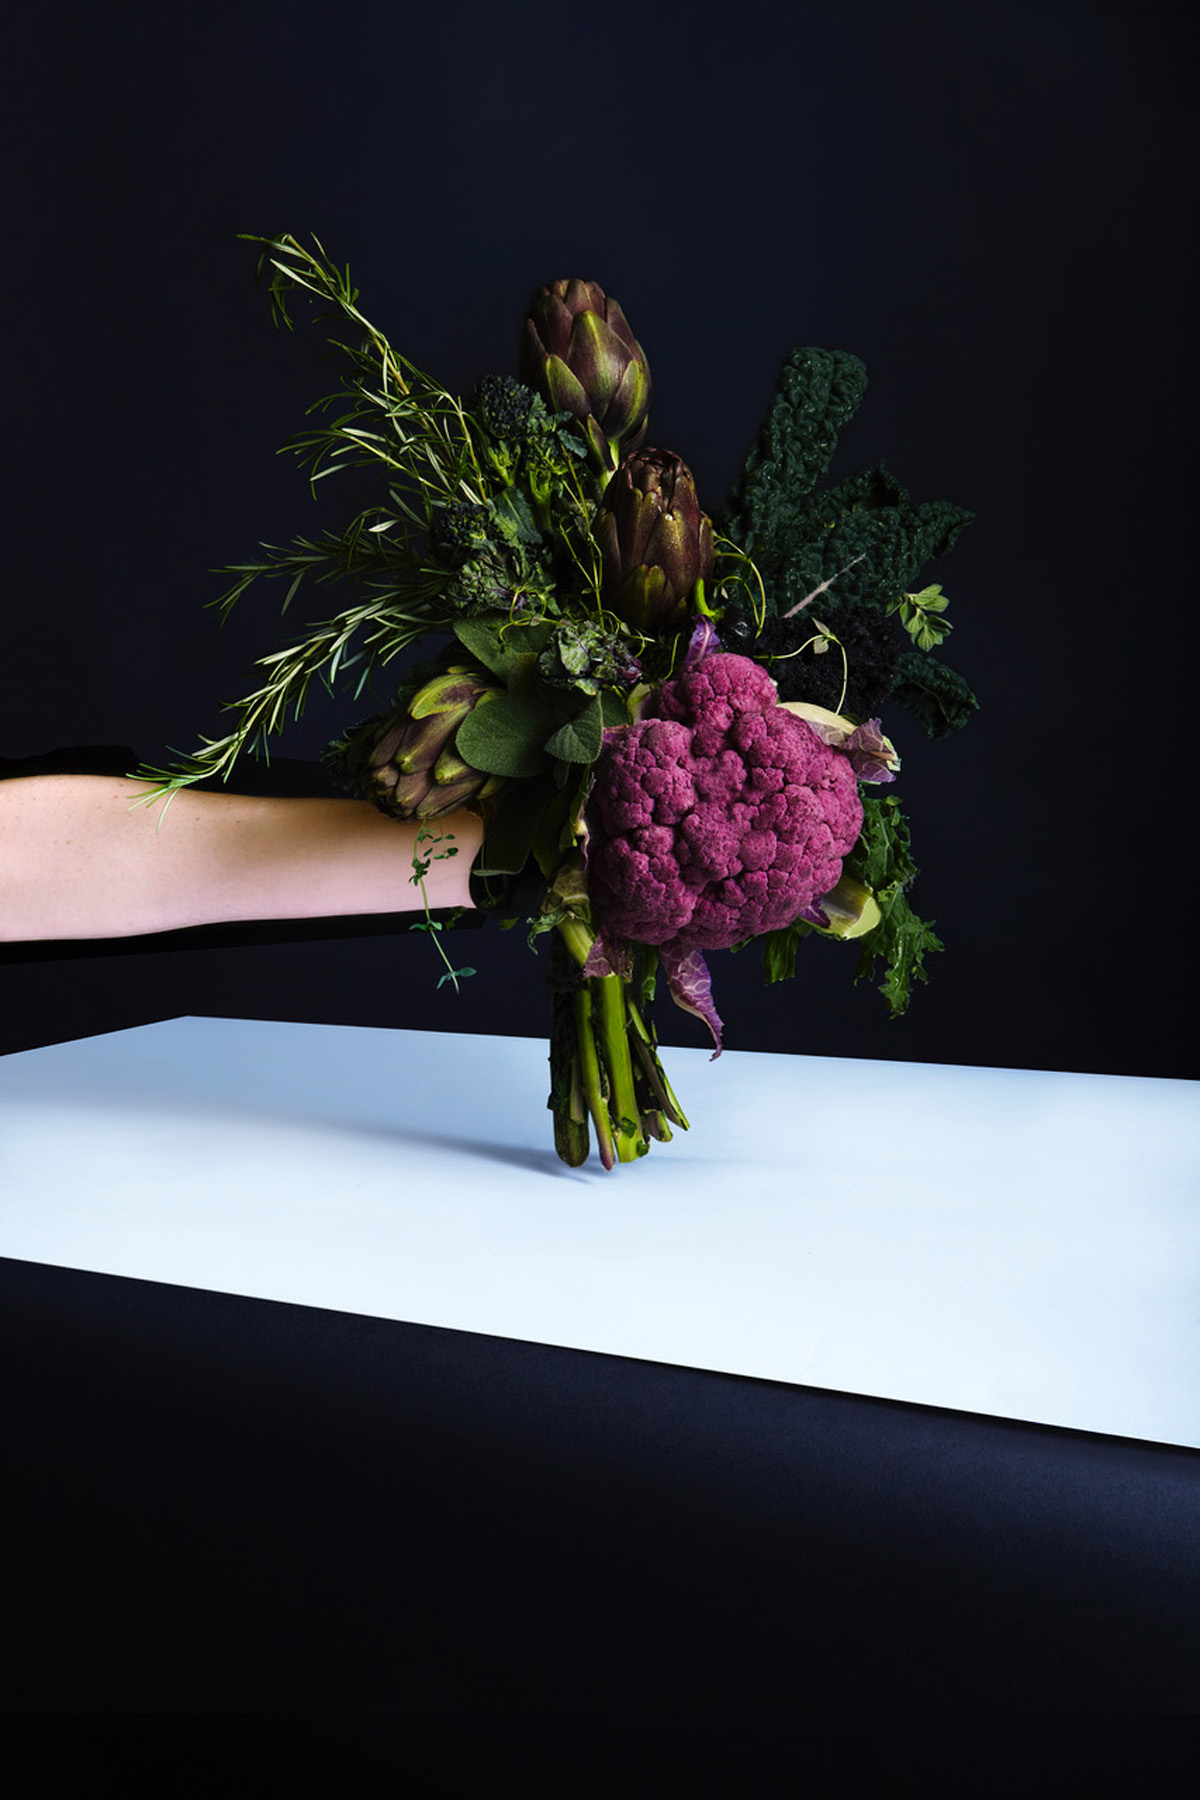 11-icon-artist-management-katie-hammond-food-_deep_purple_061_ret_flat.jpg